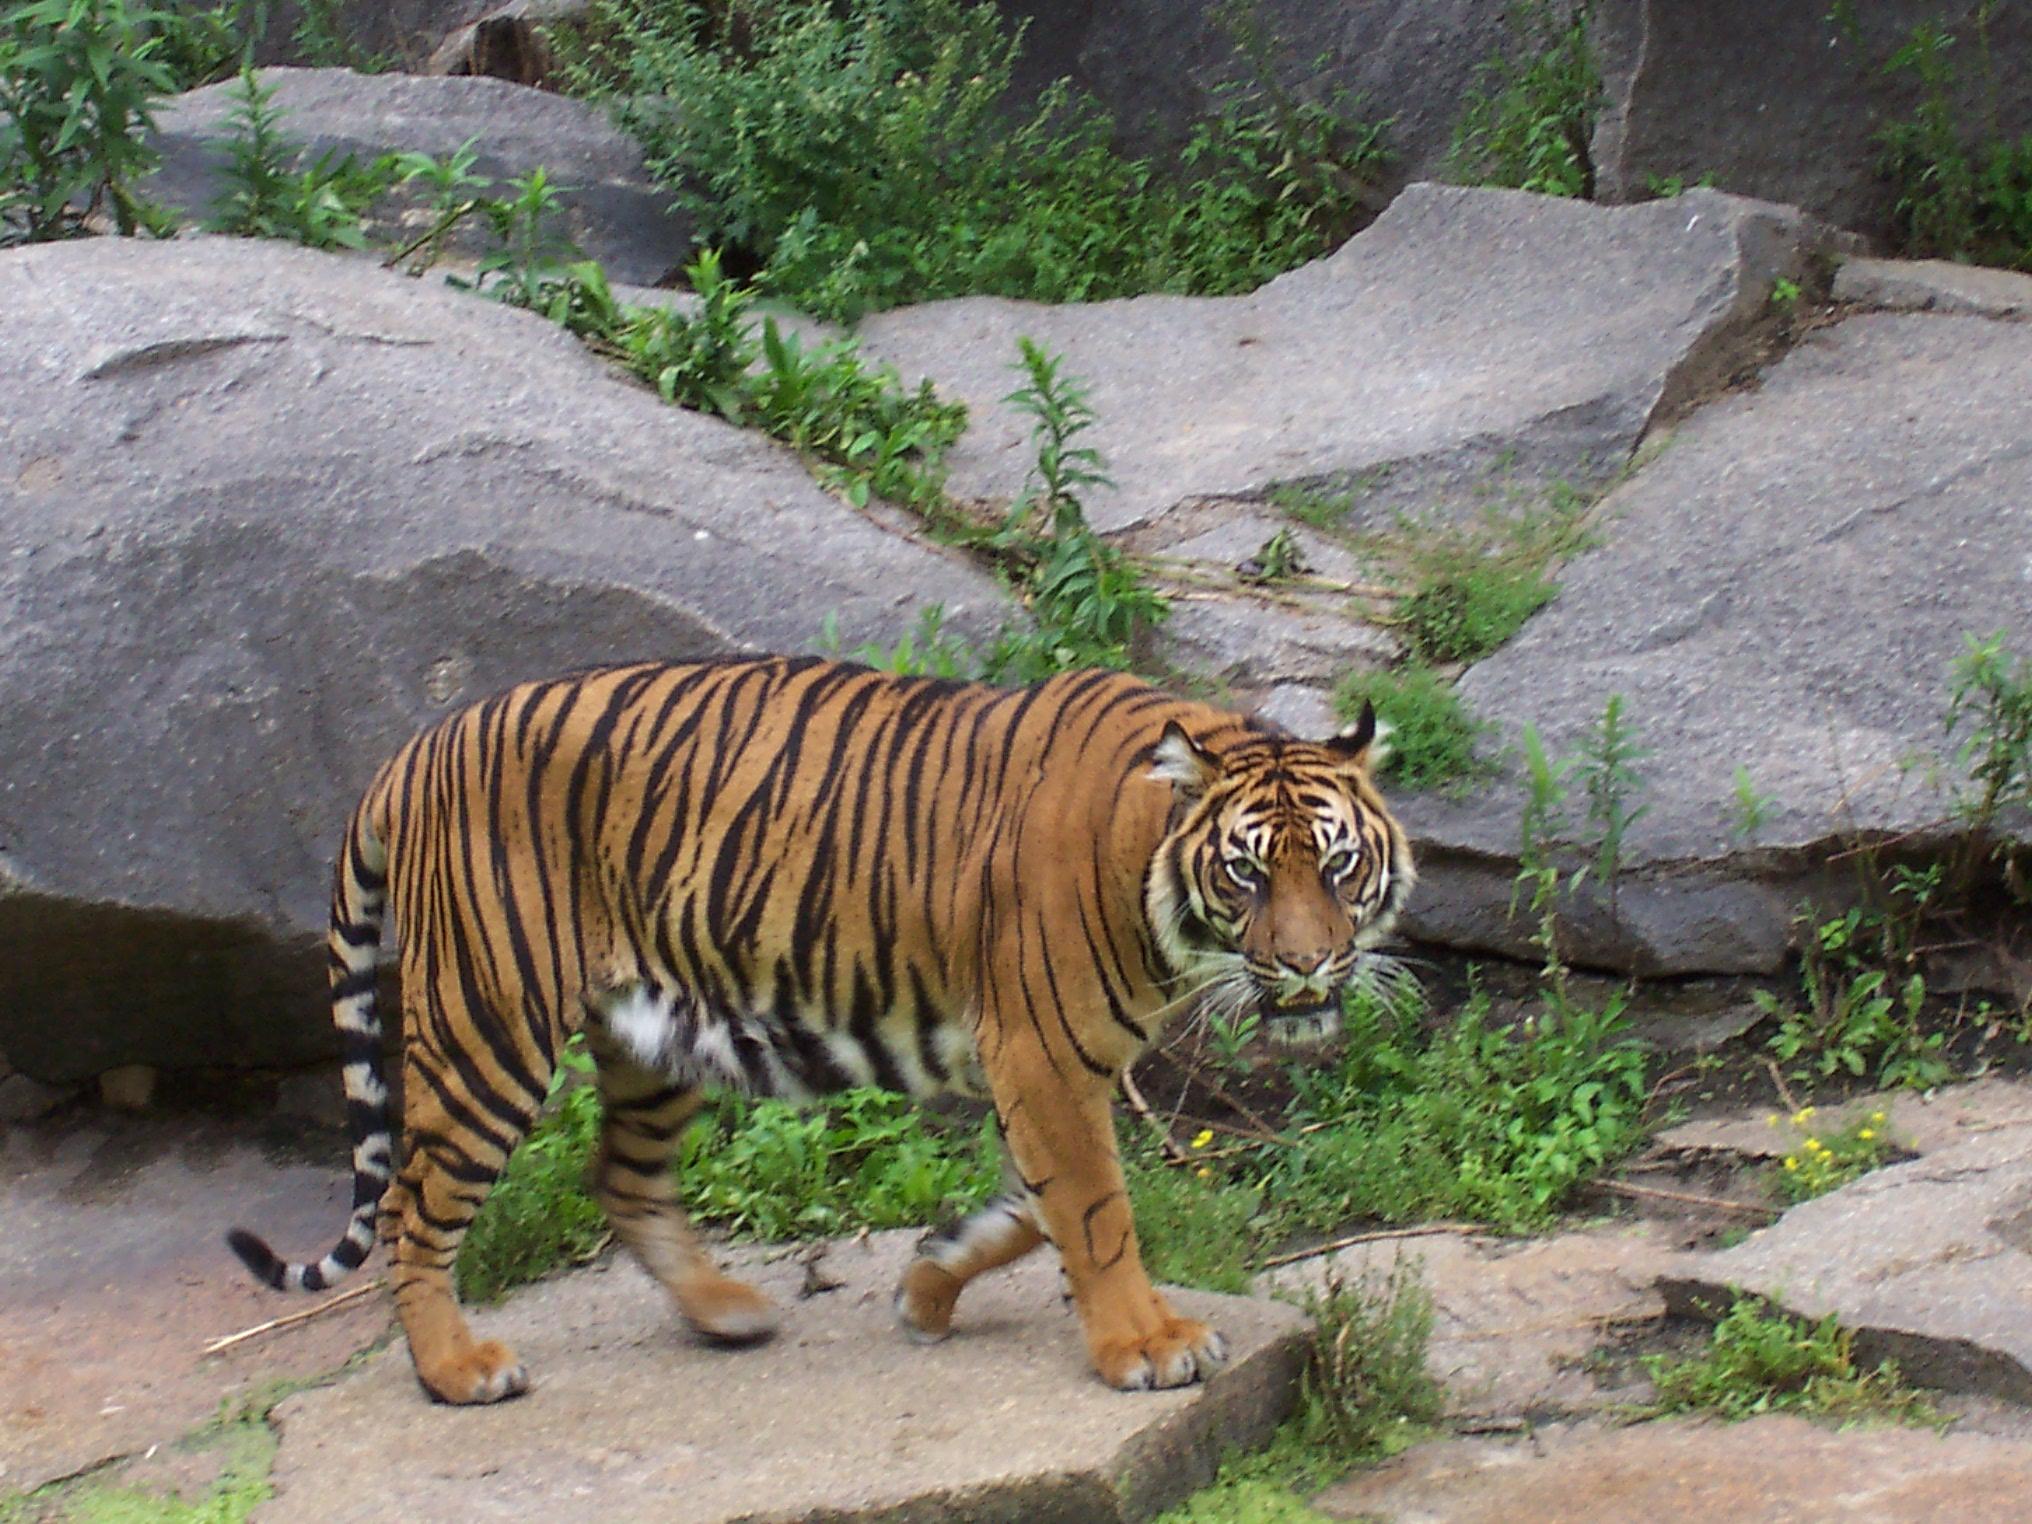 Bestand:Sumatraanse tijger (Tierpark Berlin).JPG - Wikipedia: nl.wikipedia.org/wiki/Bestand:Sumatraanse_tijger_(Tierpark_Berlin).JPG